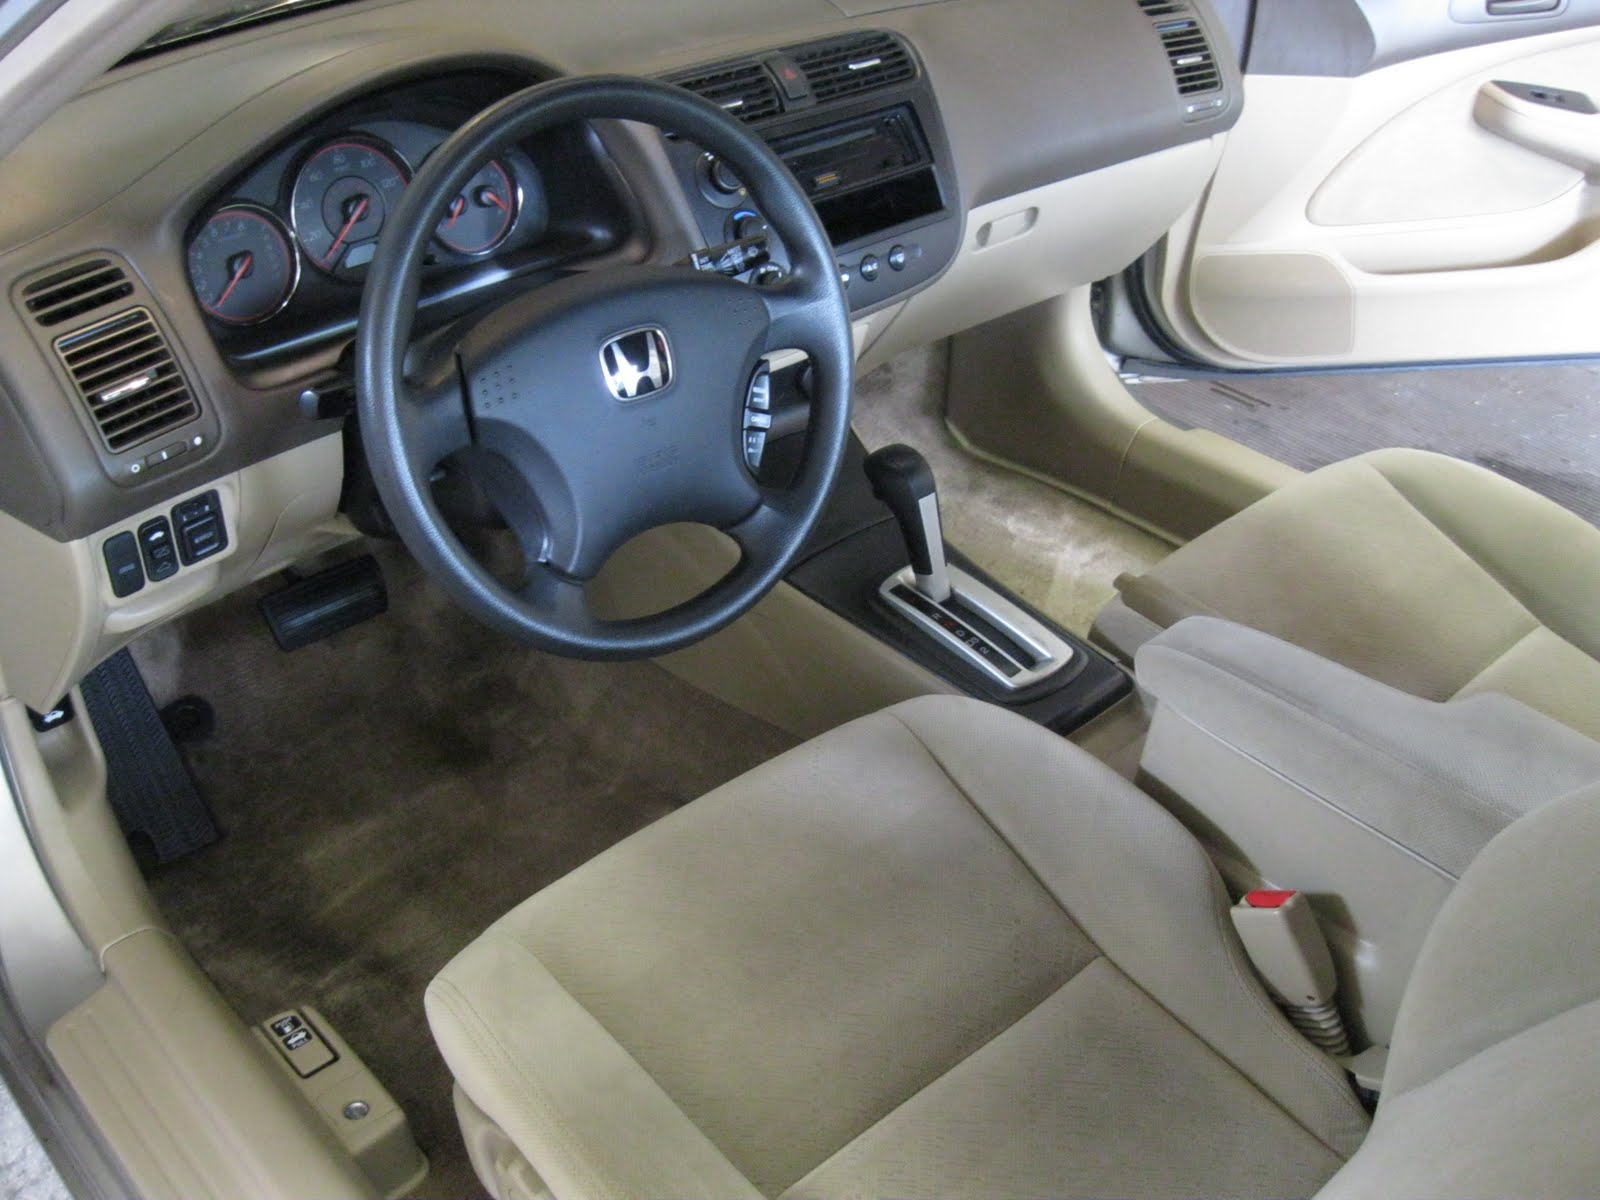 Car Detailing Prices >> Ben's Detailing: 2003 Honda Civic Coupe - Interior Detail